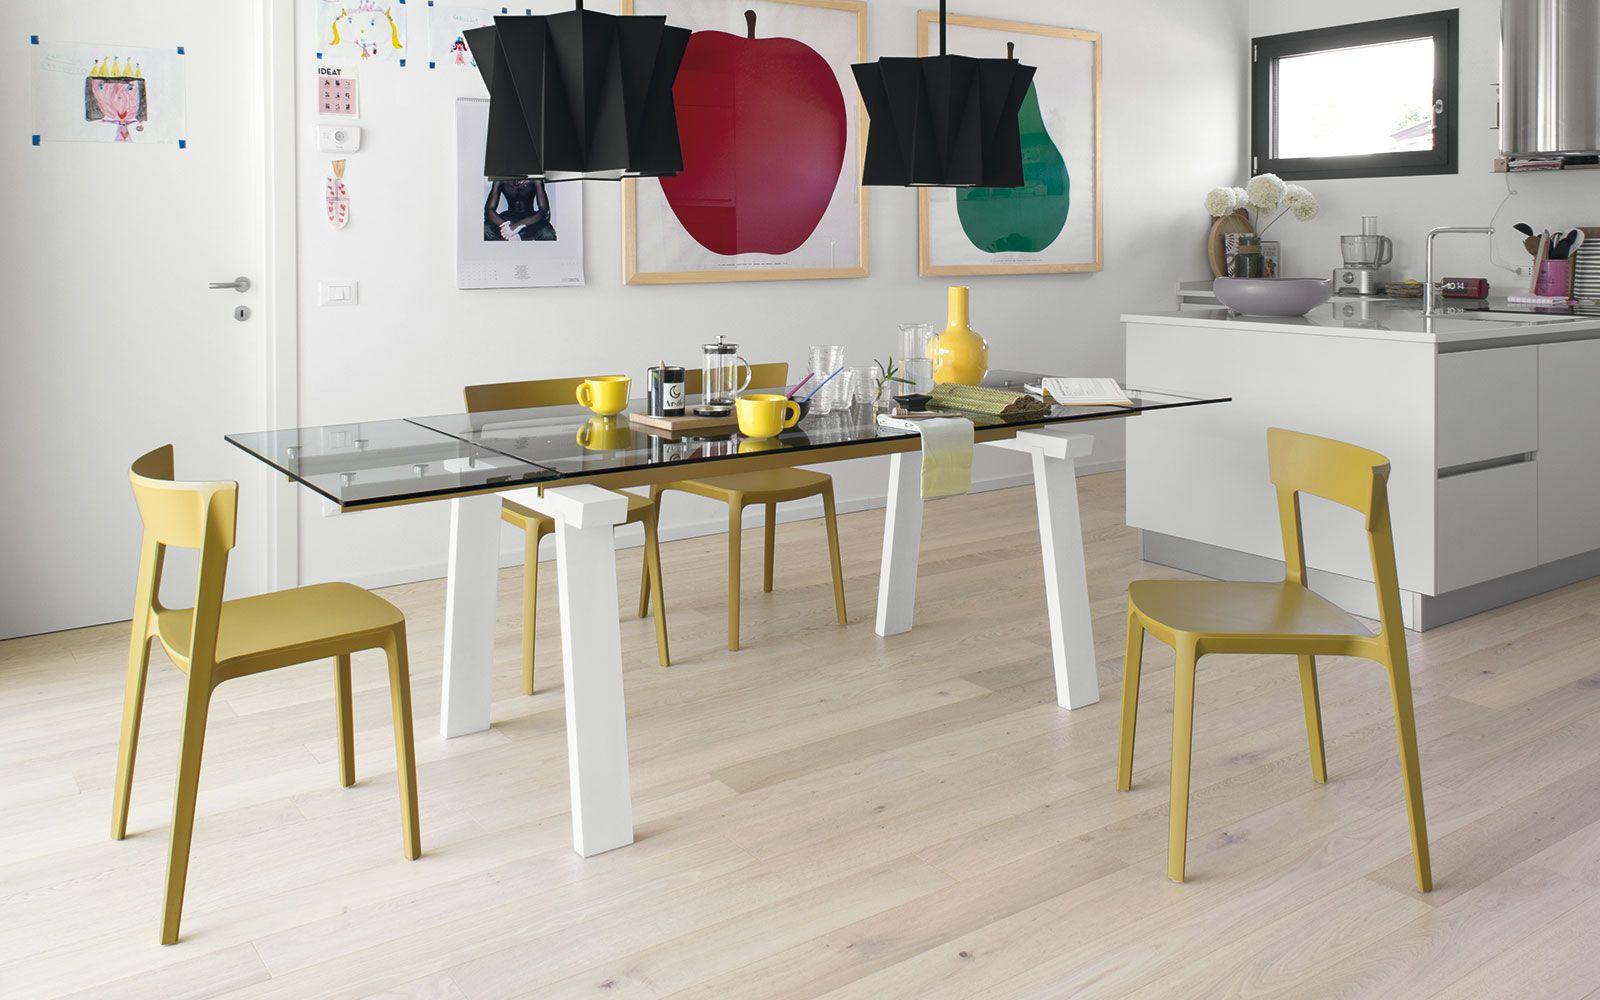 Tavolo e sedie calligaris tavoli da pranzo dining dining room